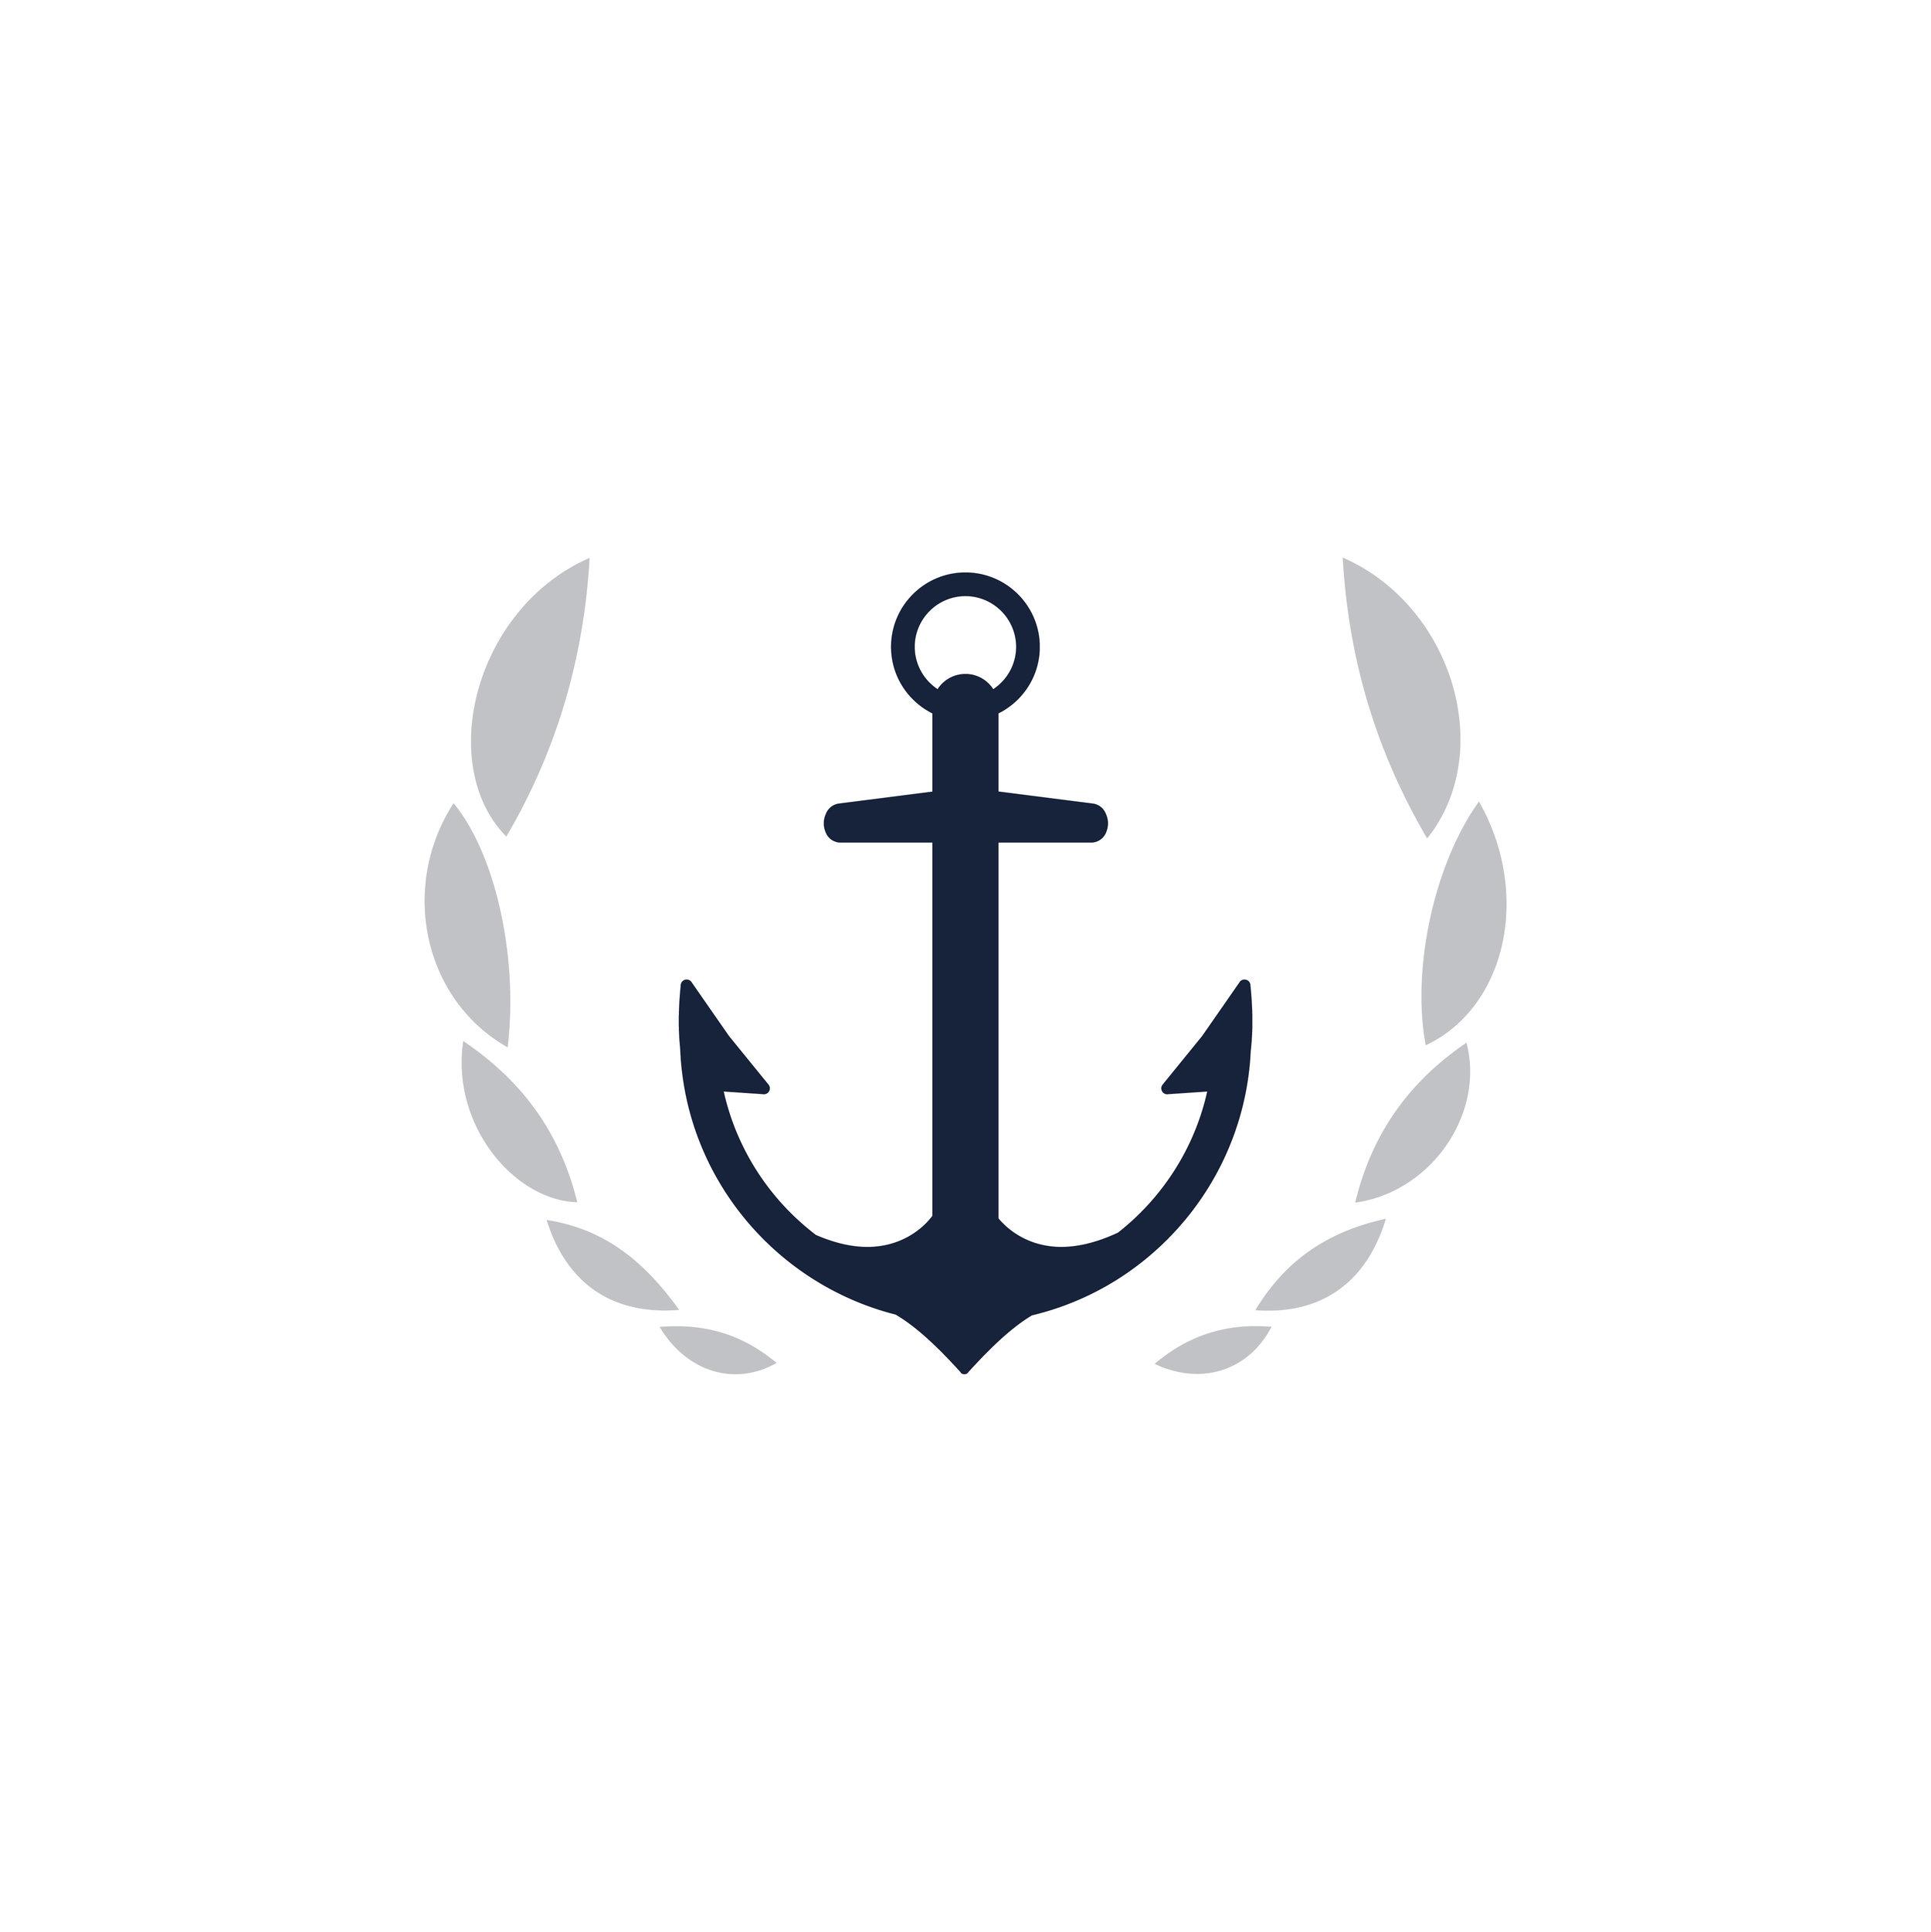 creative punch logo-13.jpg